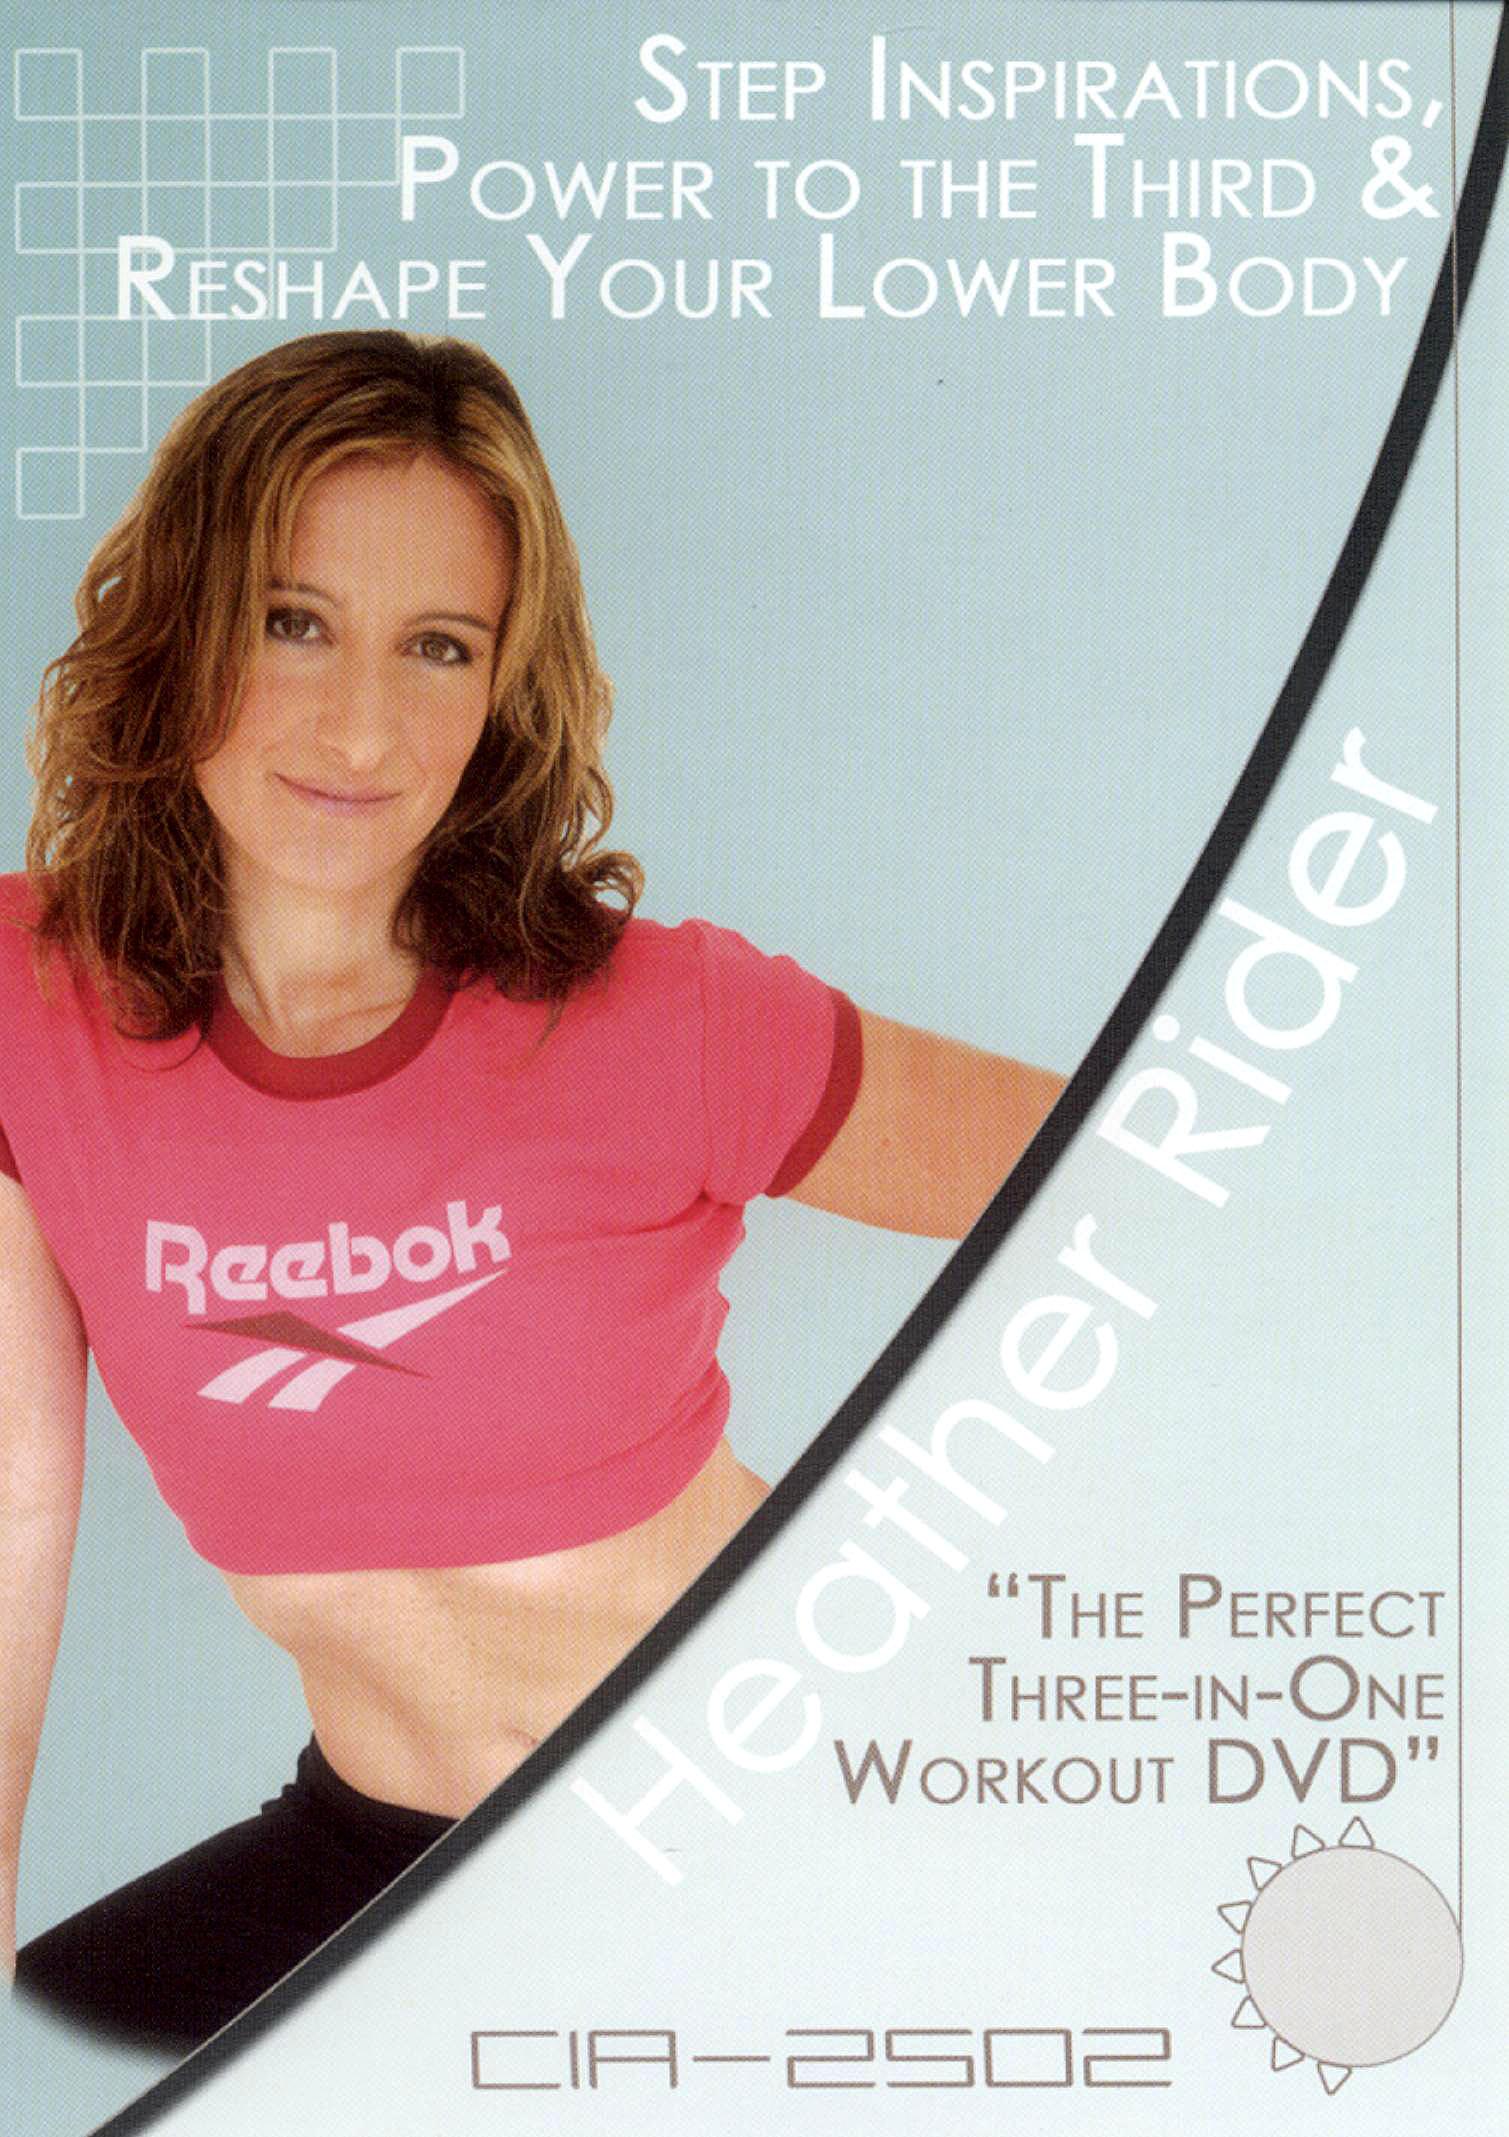 Heather Rider: Step Inspirations